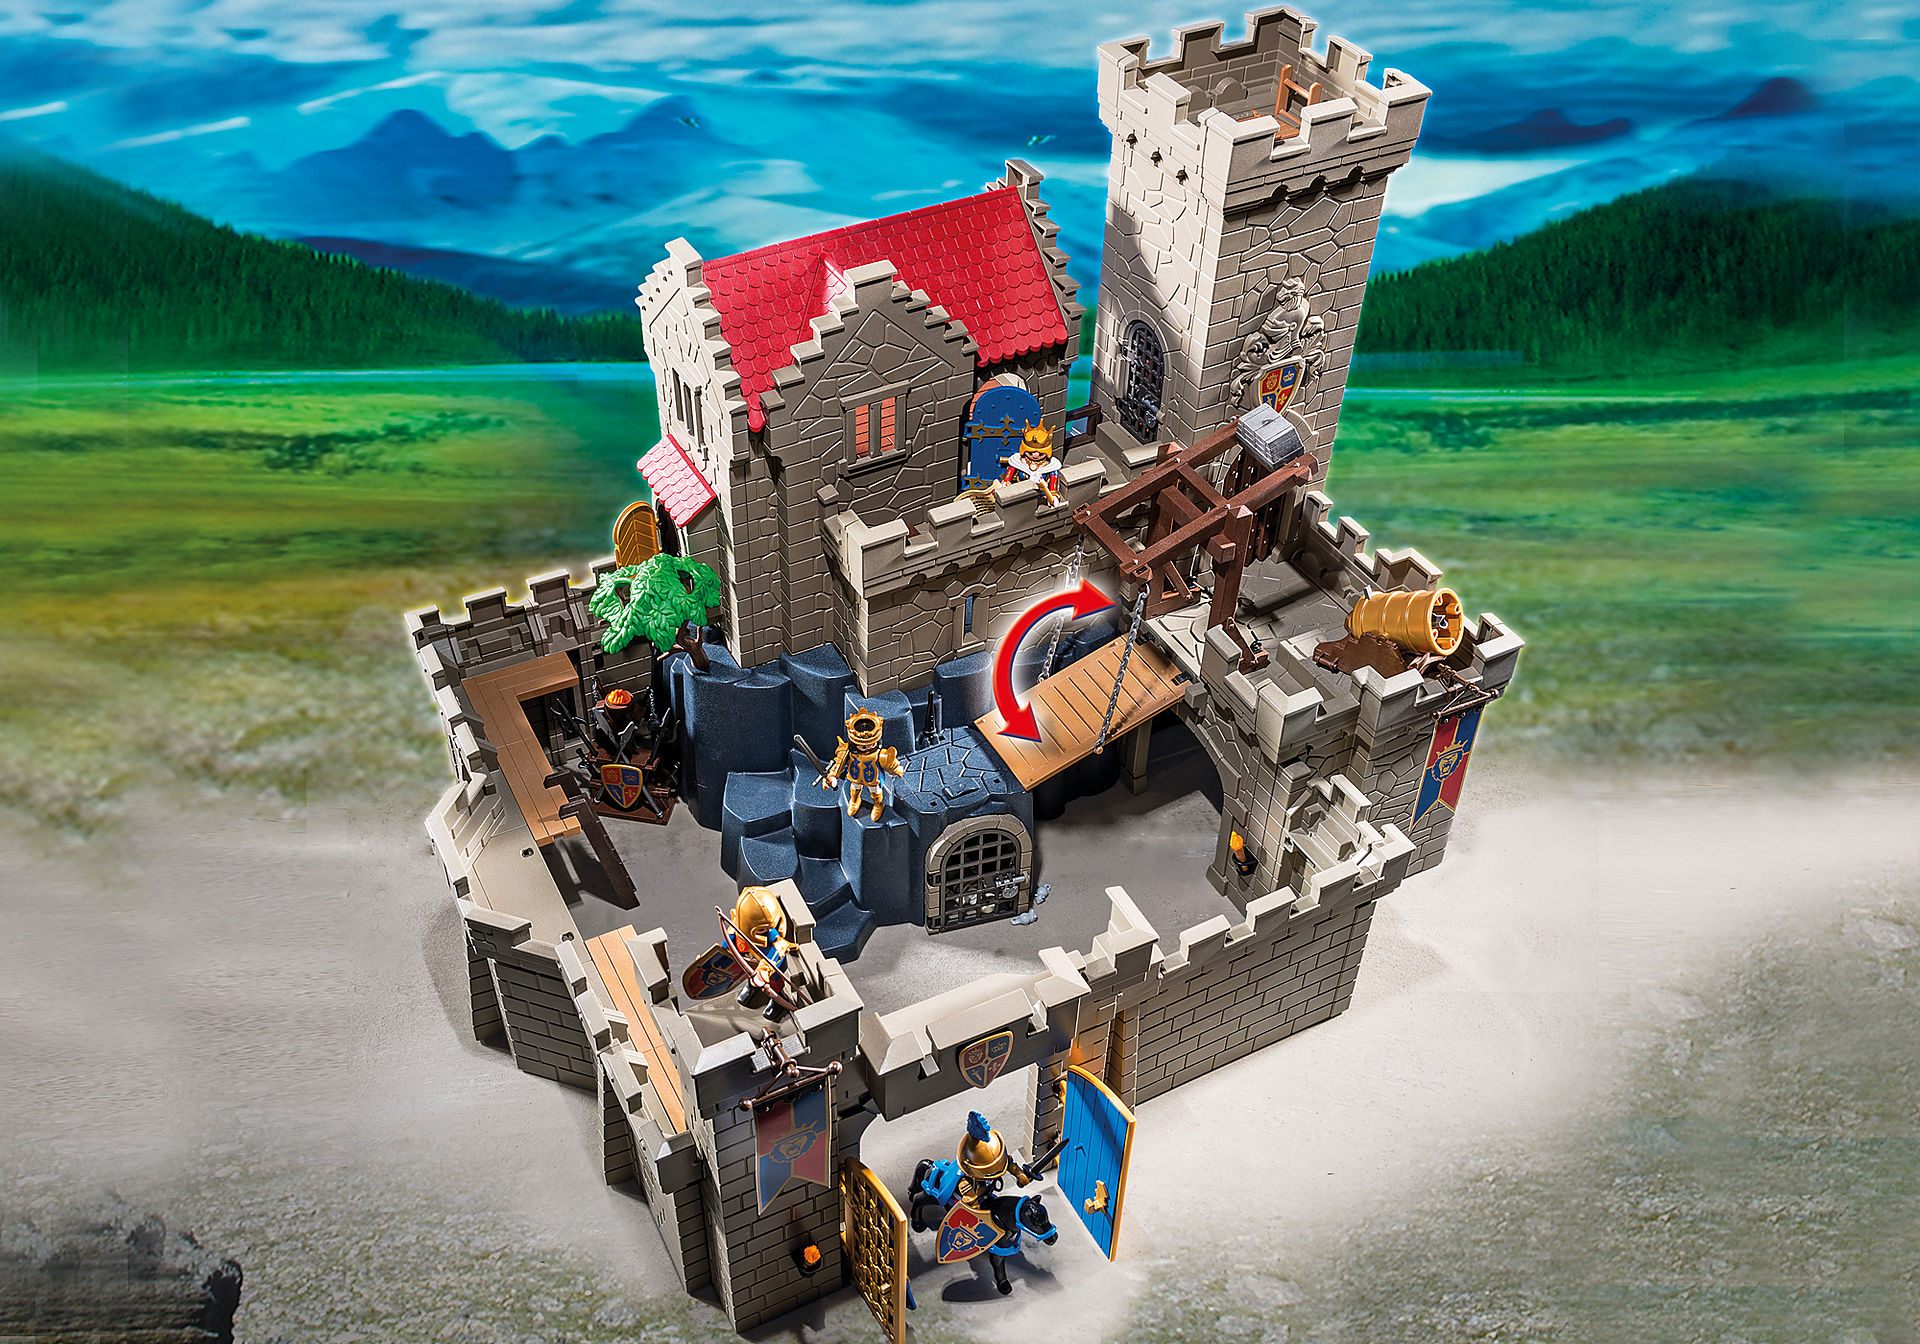 http://media.playmobil.com/i/playmobil/6000_product_extra2/Koningskasteel van de orde van de Leeuwenridders